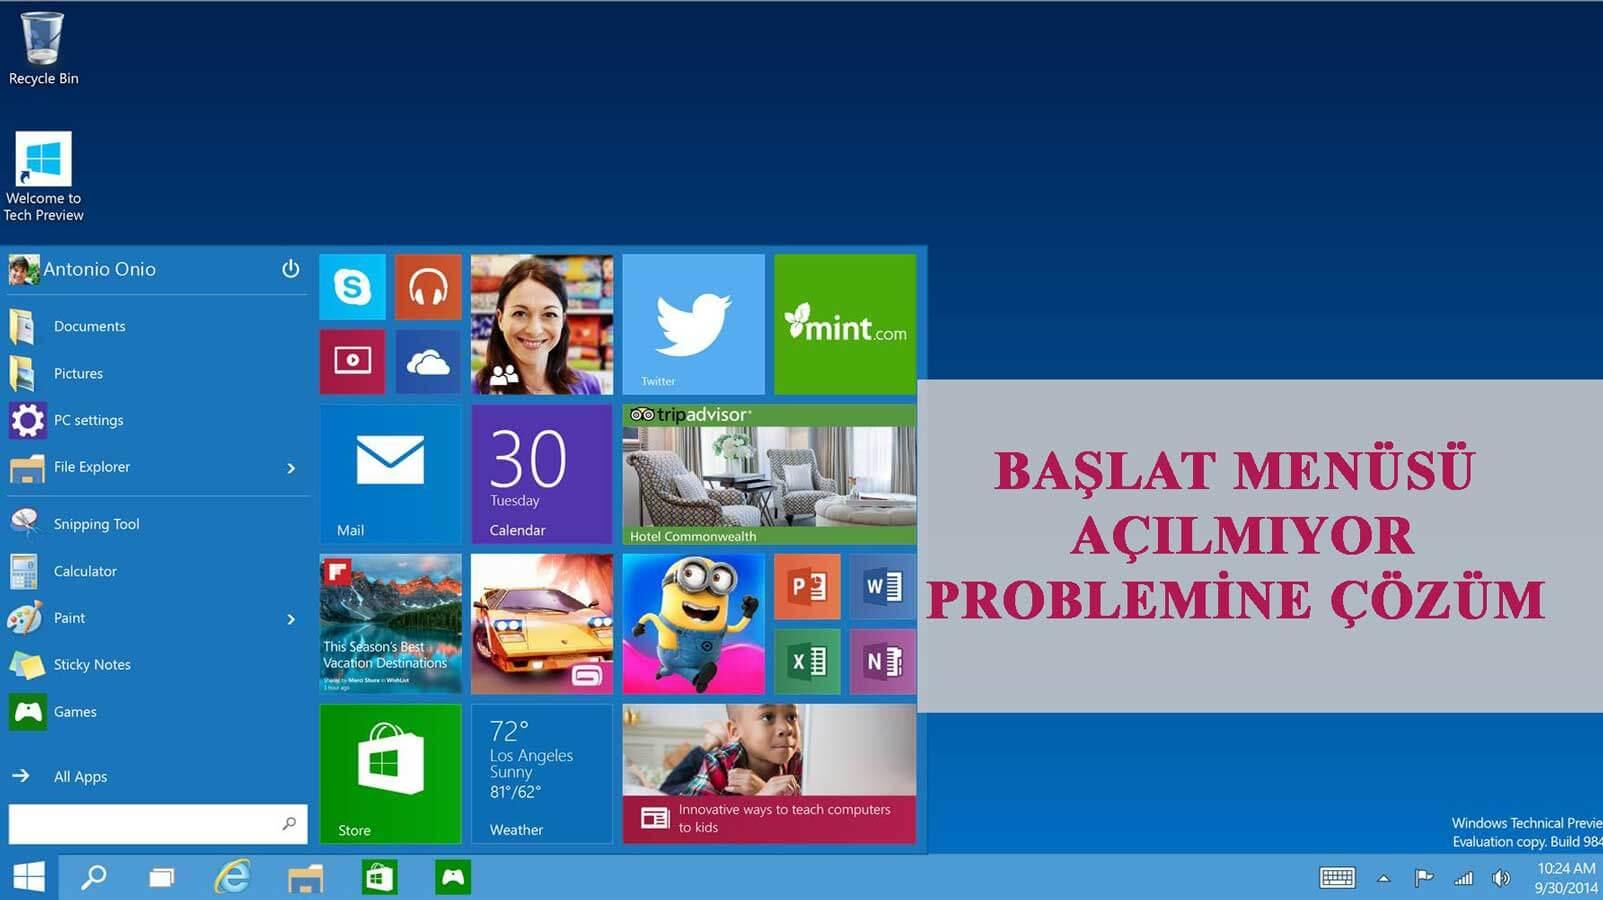 Windows 10 Başlat Menüsü Başlat Menüsü Çalışmıyor Başlat Menüsü Çalışmıyor Sorununa Çözüm windows 10 baslat menusu